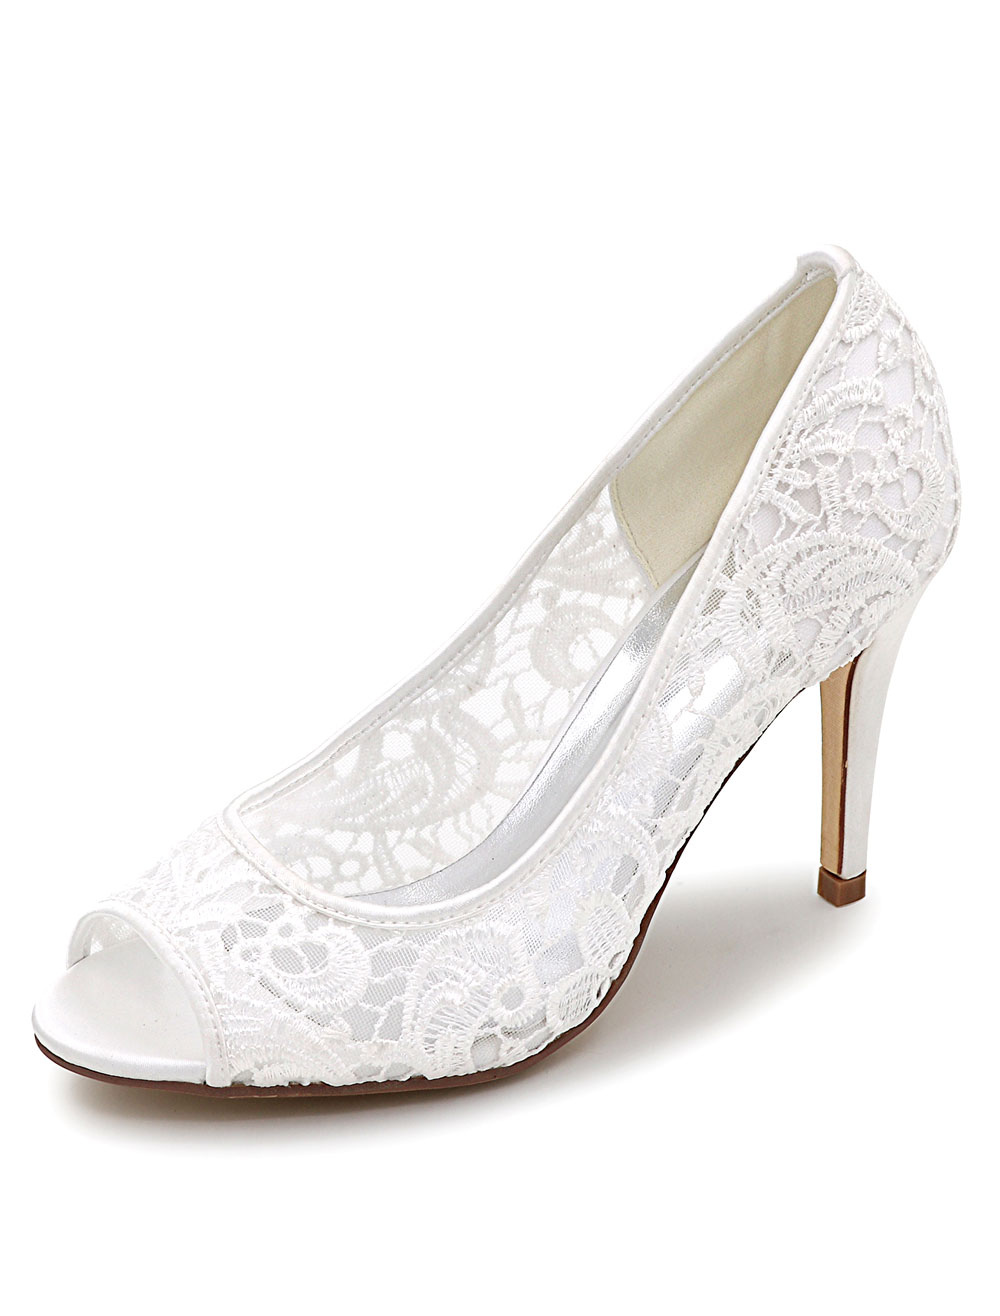 Lace Wedding Shoes Peep High Heel Bridal Shoes